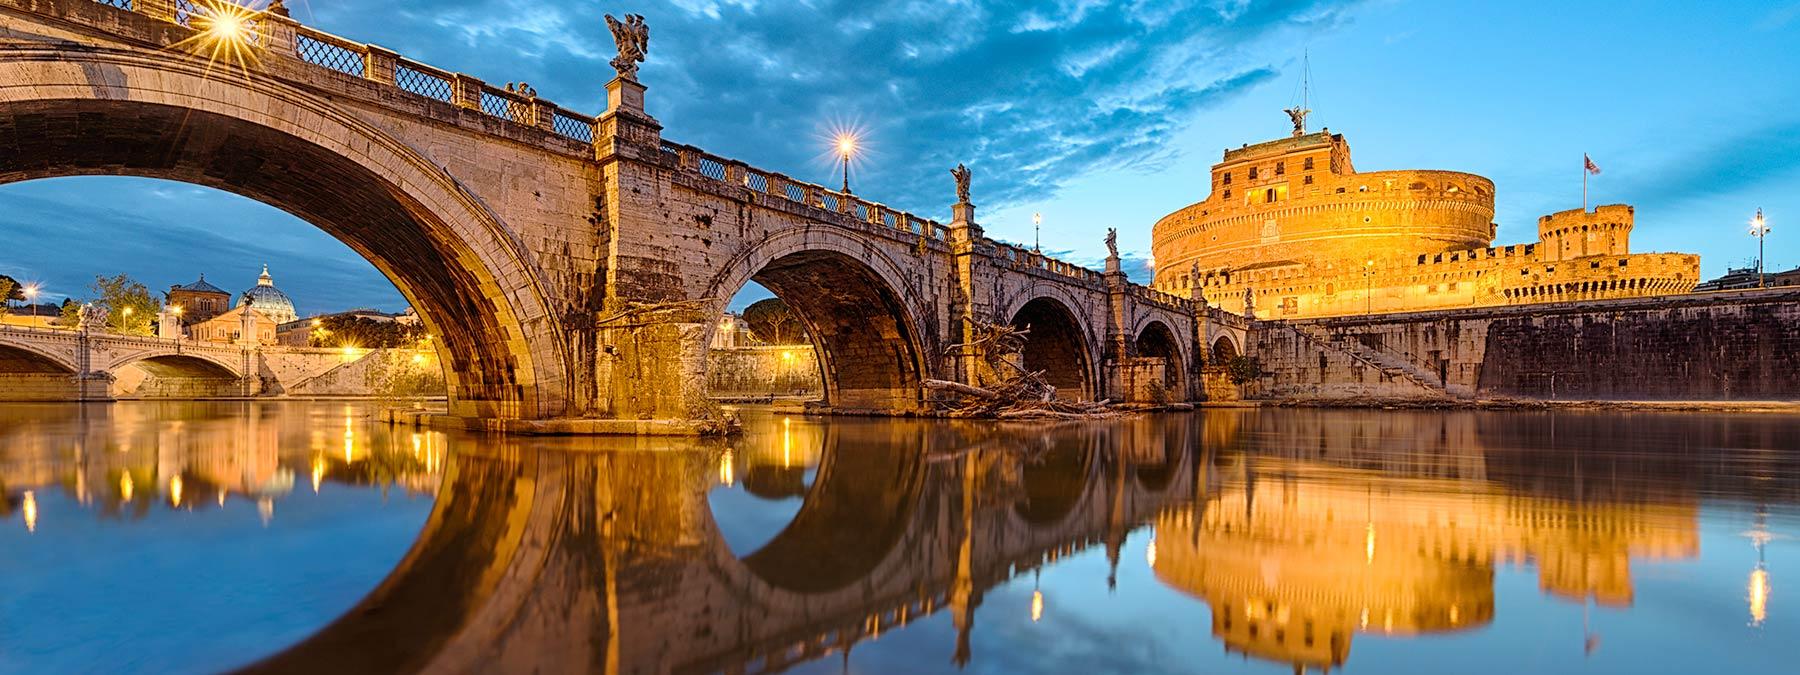 Roman Dreams | Rome Italy